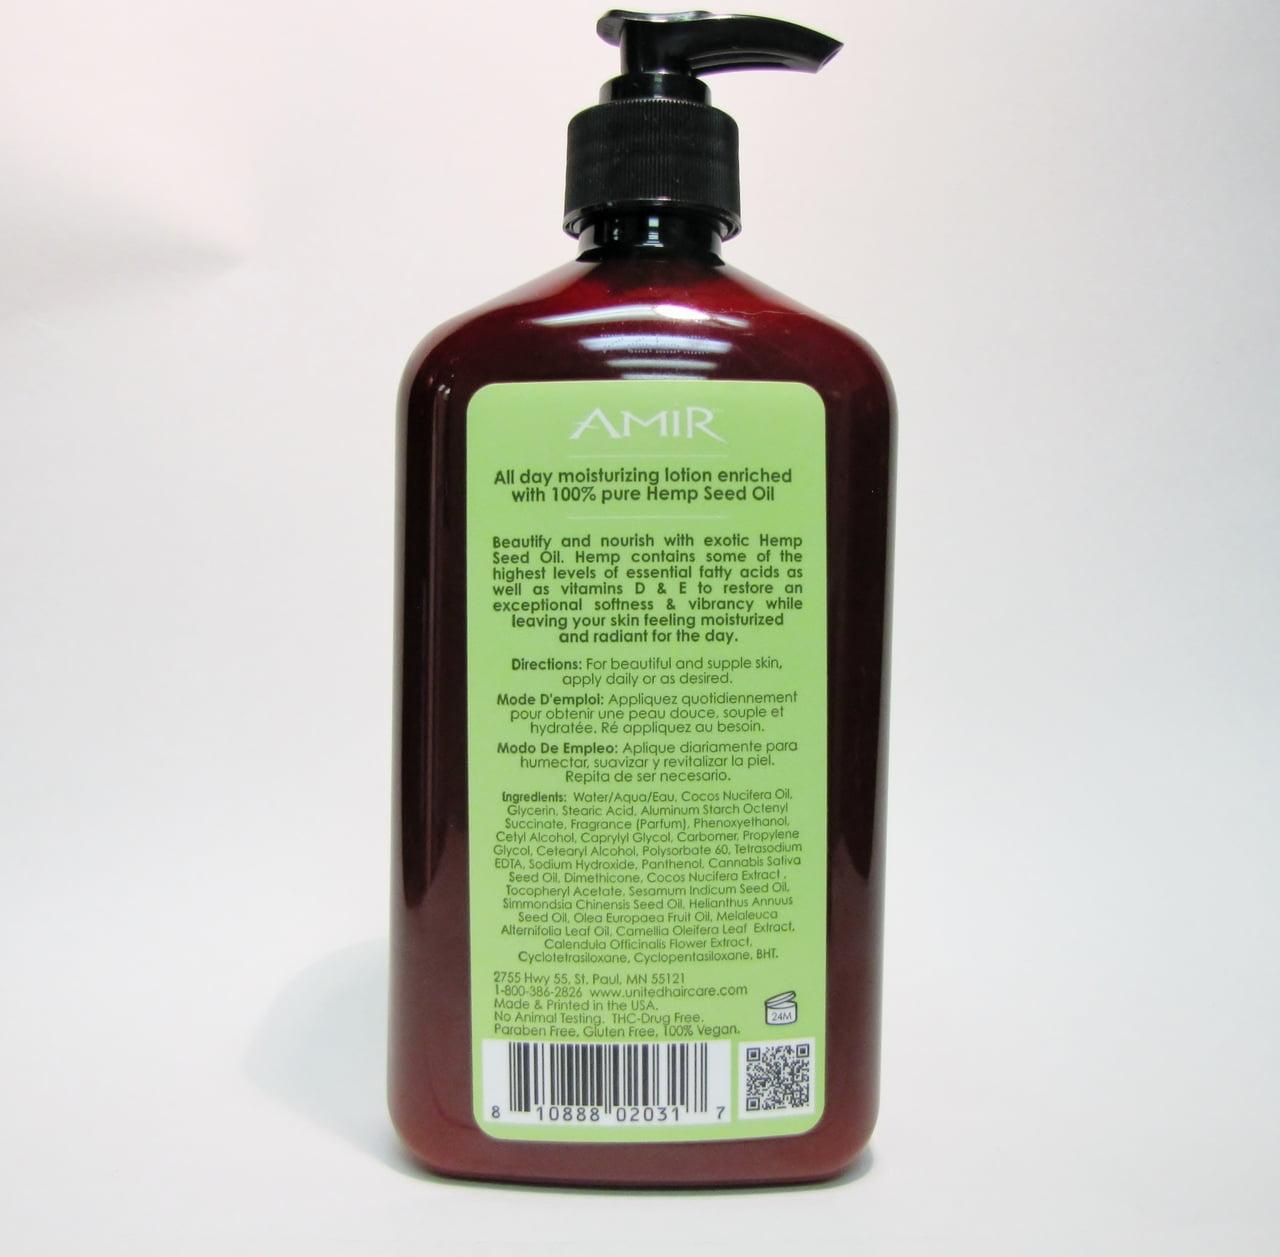 Amir Hemp Seed Oil Moisturizer - Size : 18 oz